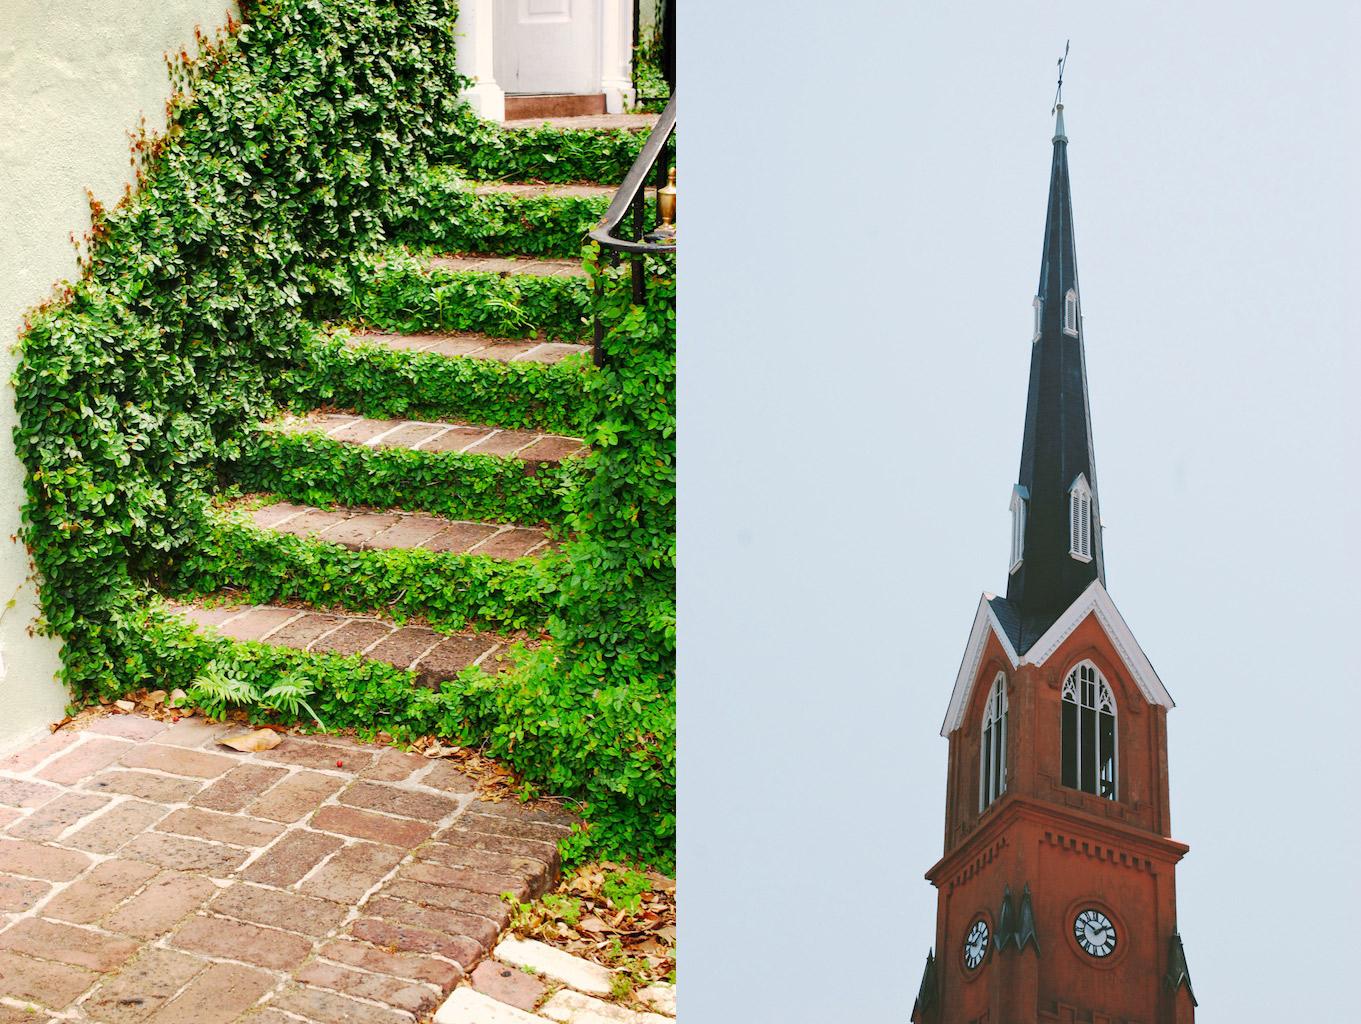 grassy steps/spire